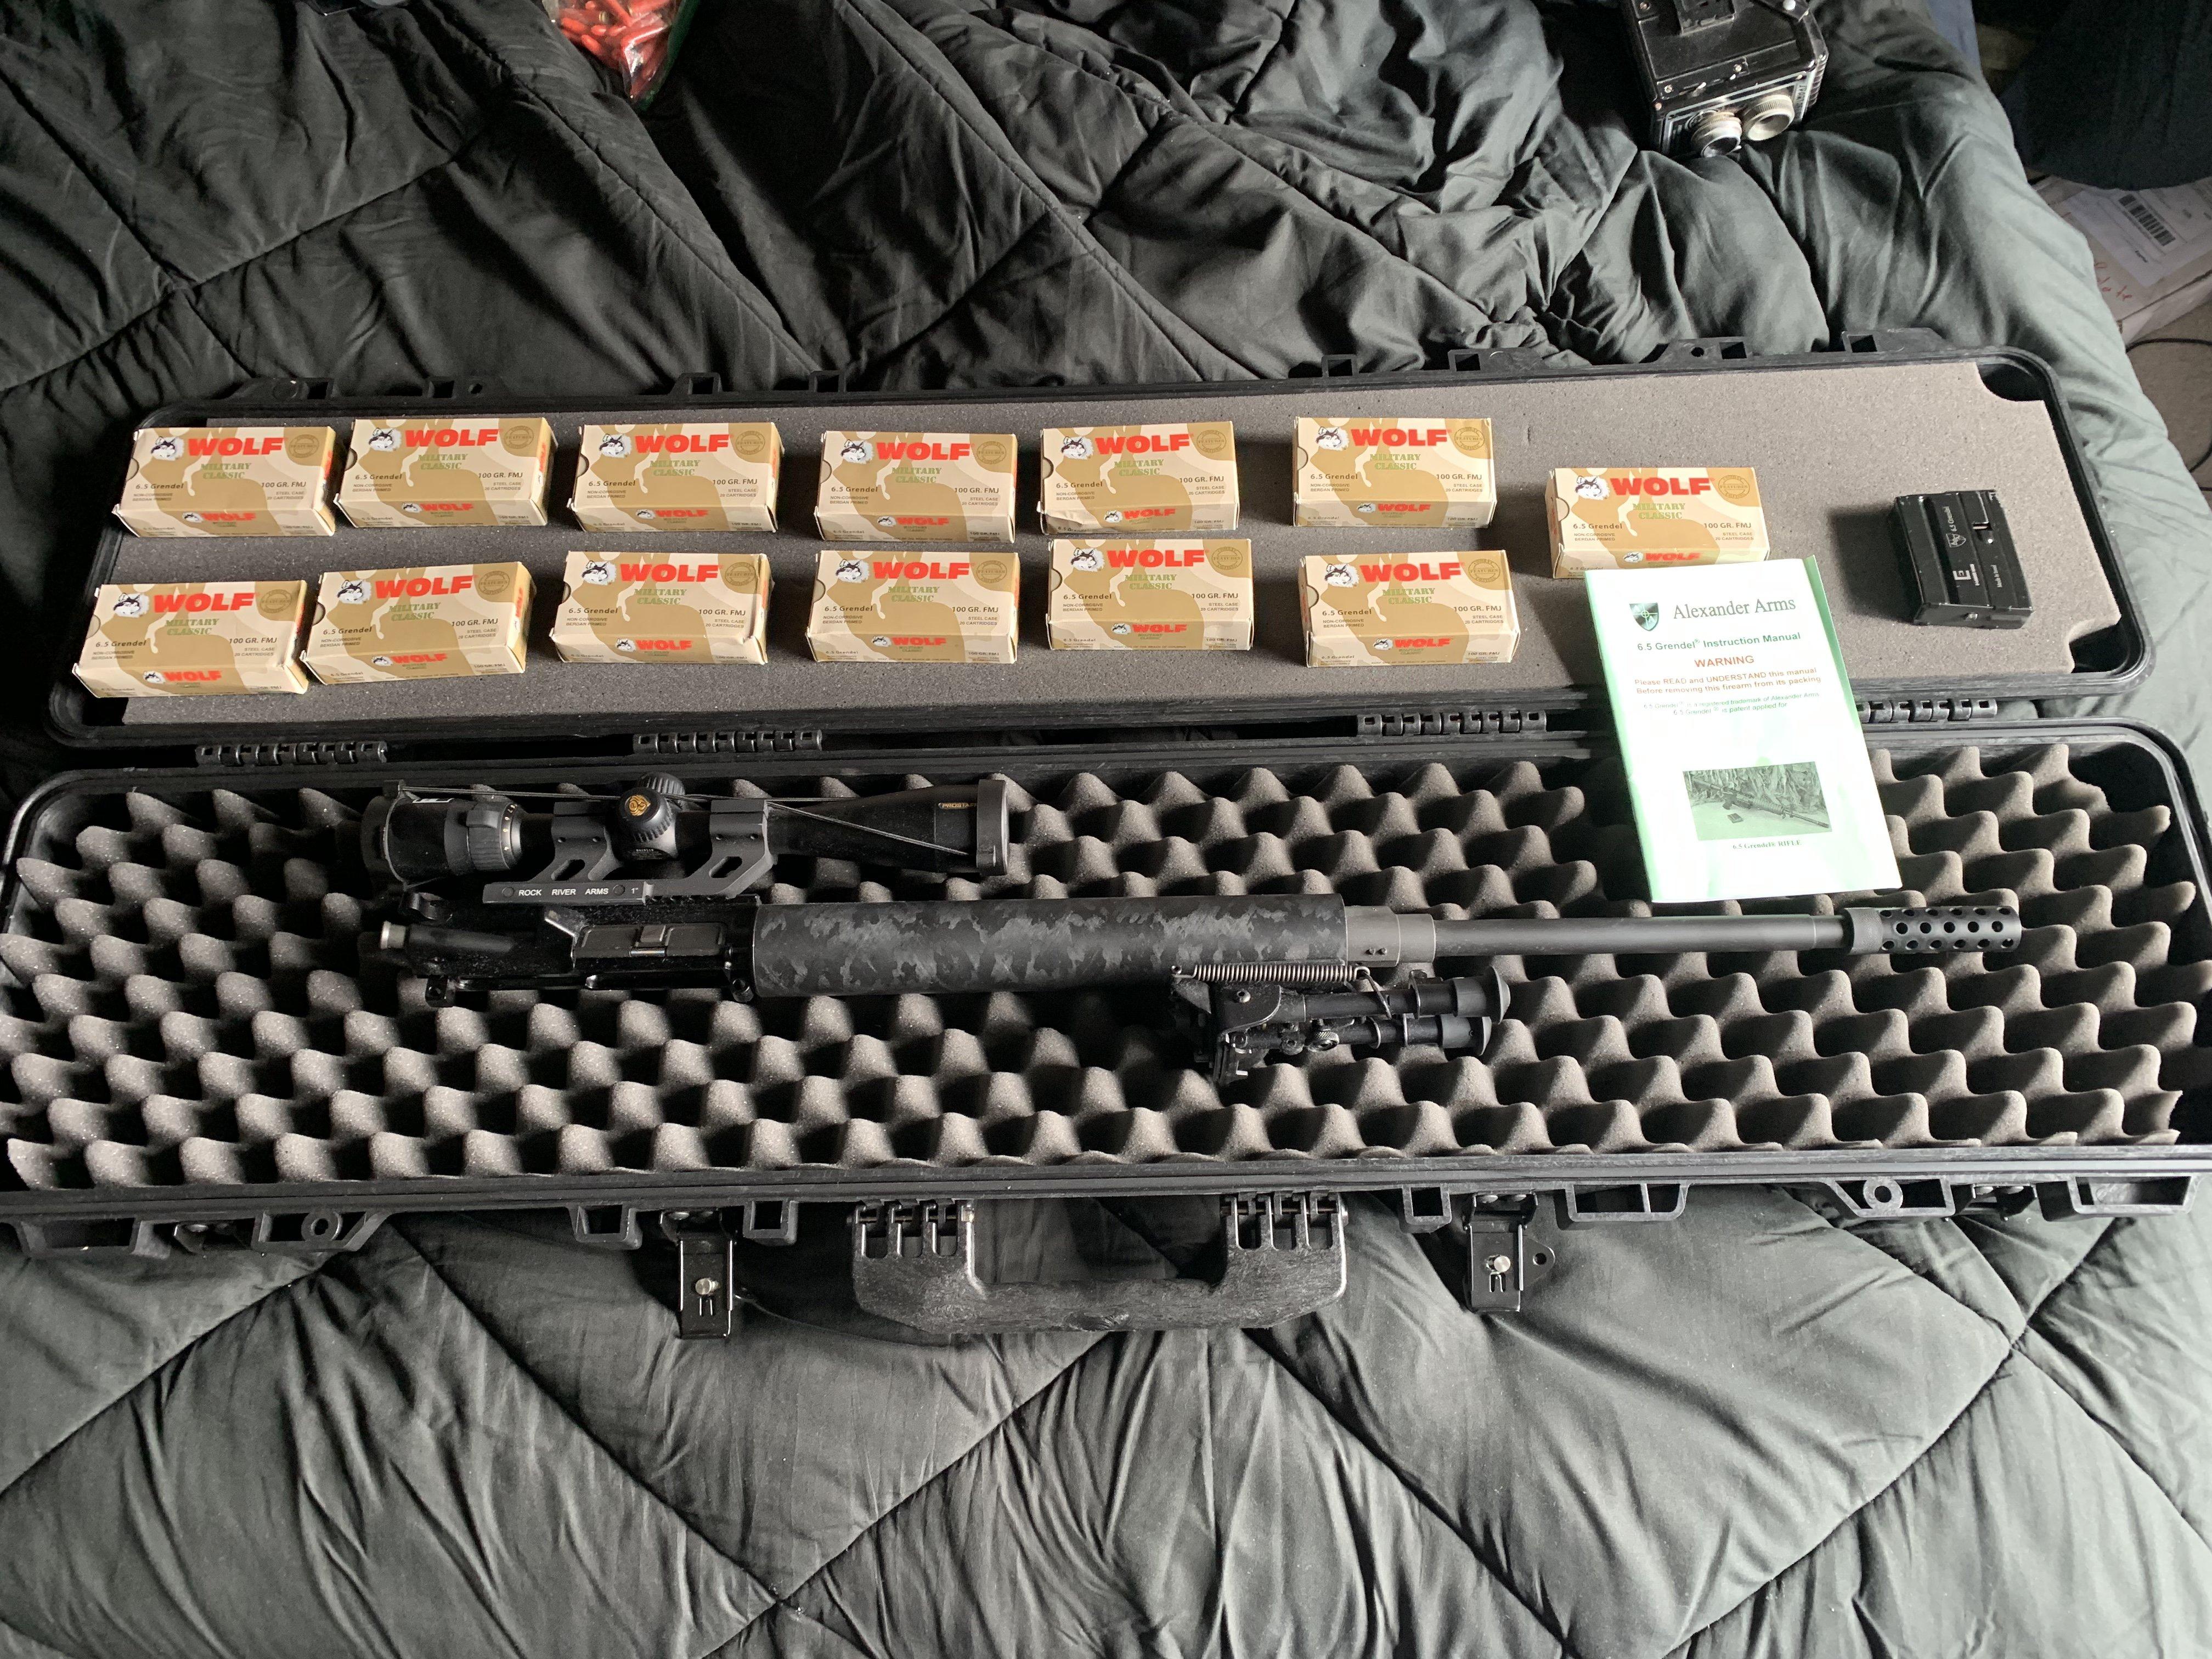 AR-15, Alexander Arms, Remington-img_6360.jpeg